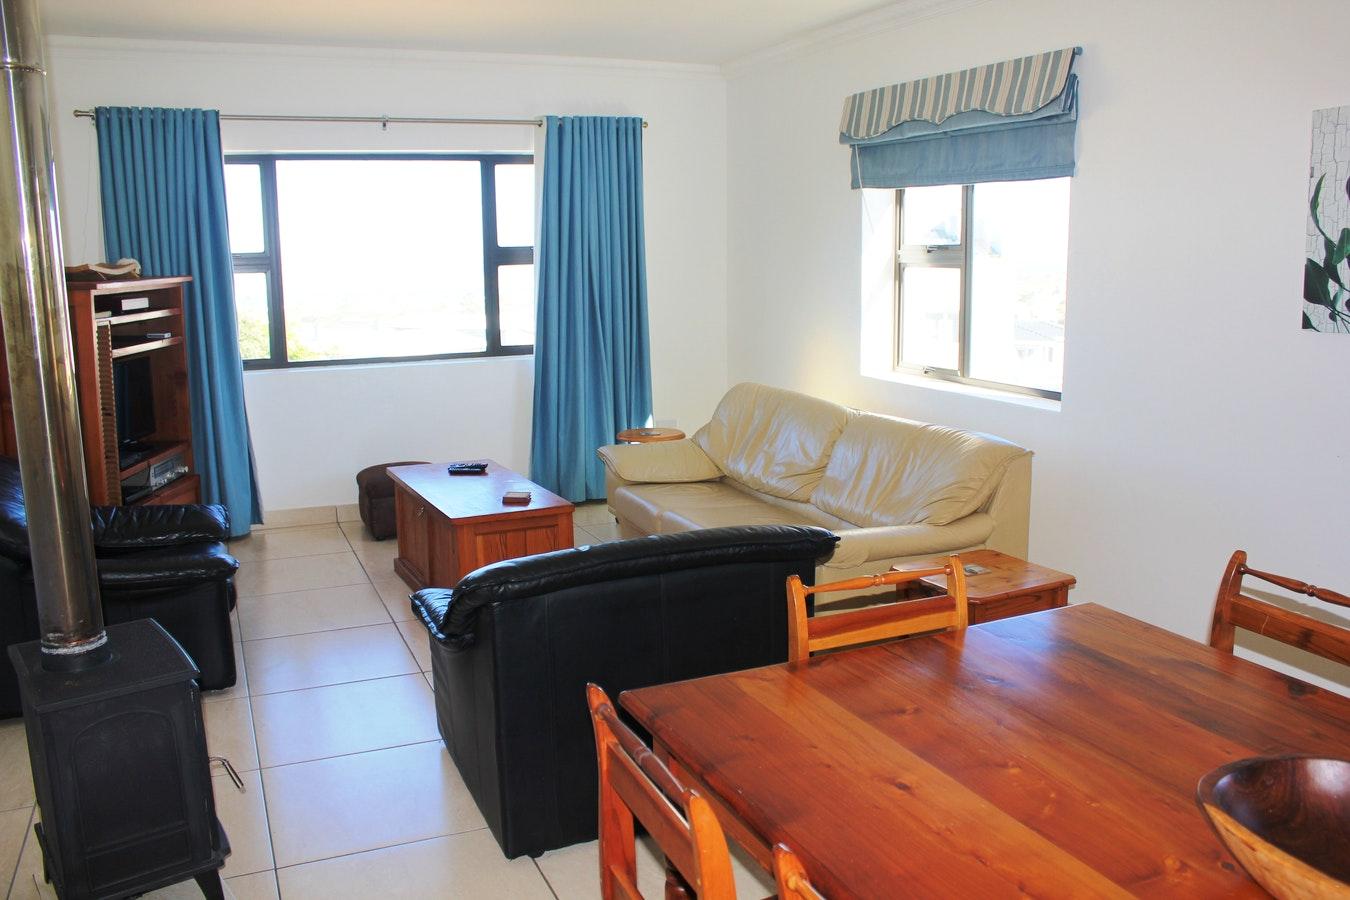 Dining area and indoor braai